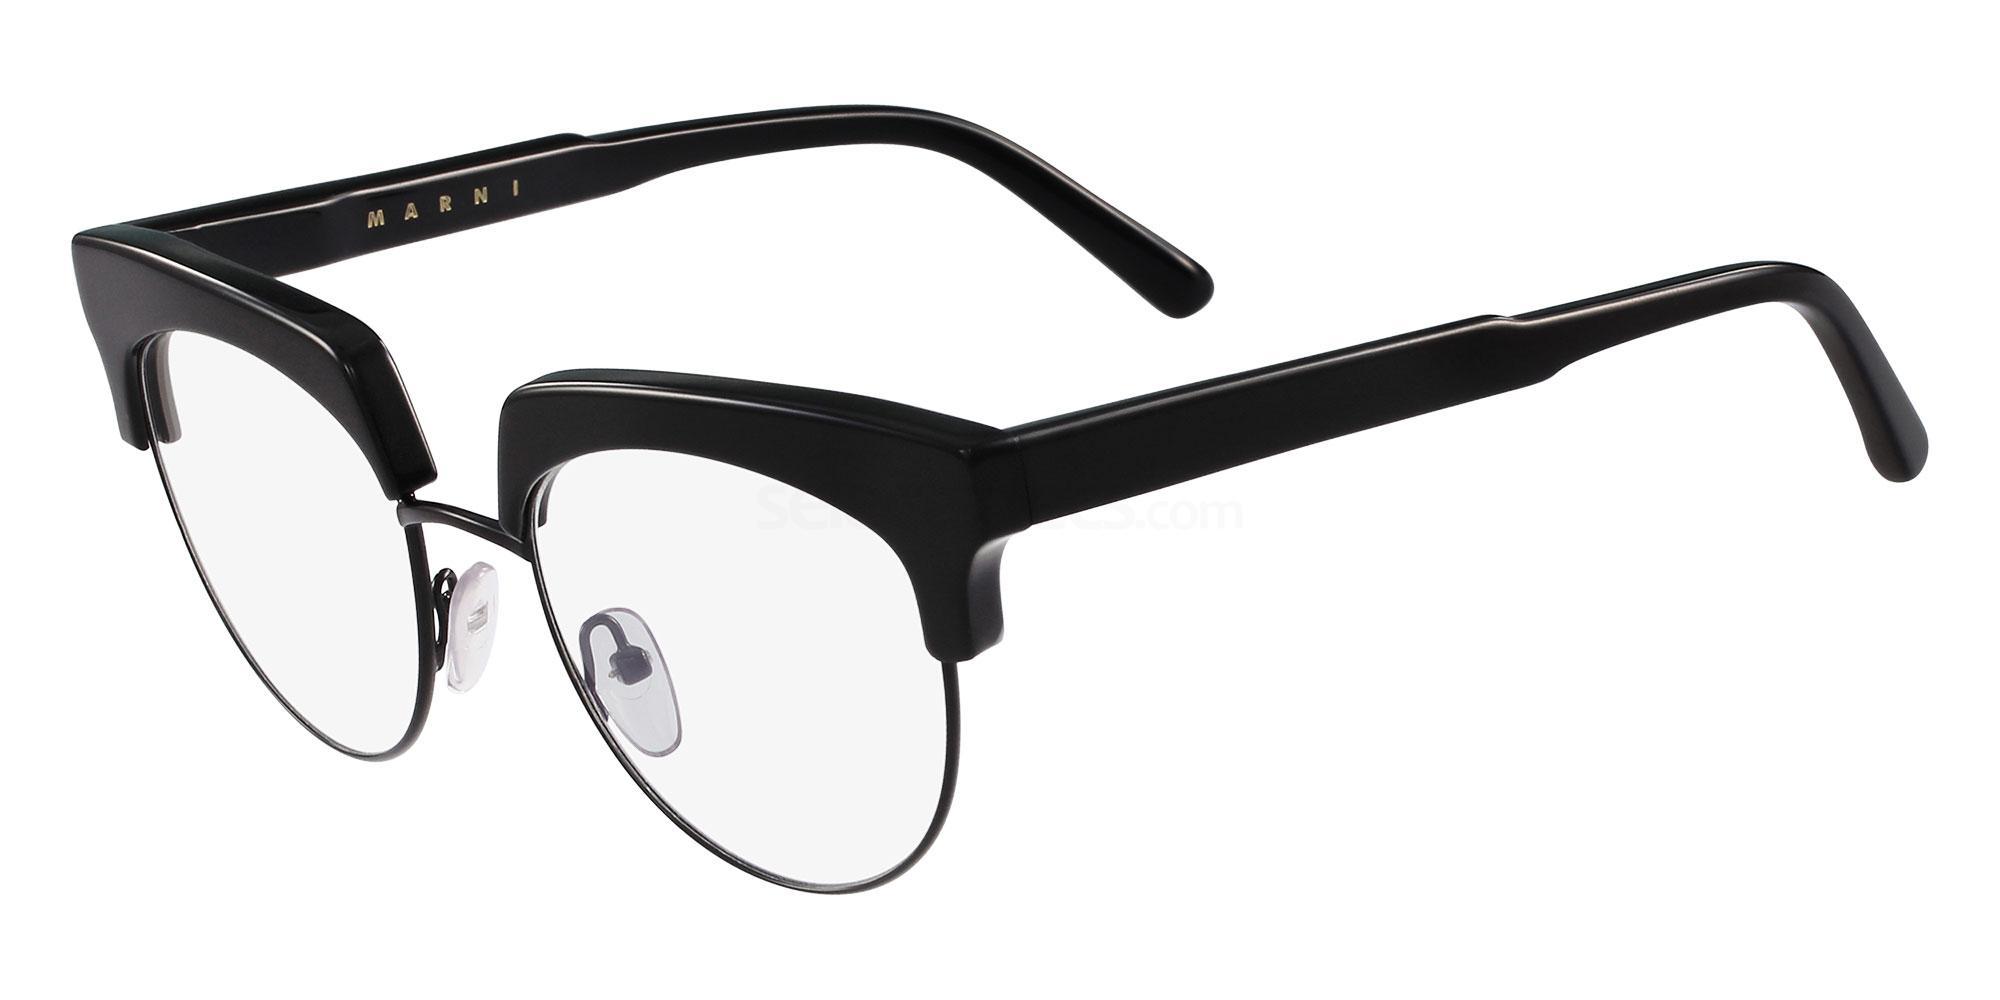 001 ME2605 Glasses, Marni